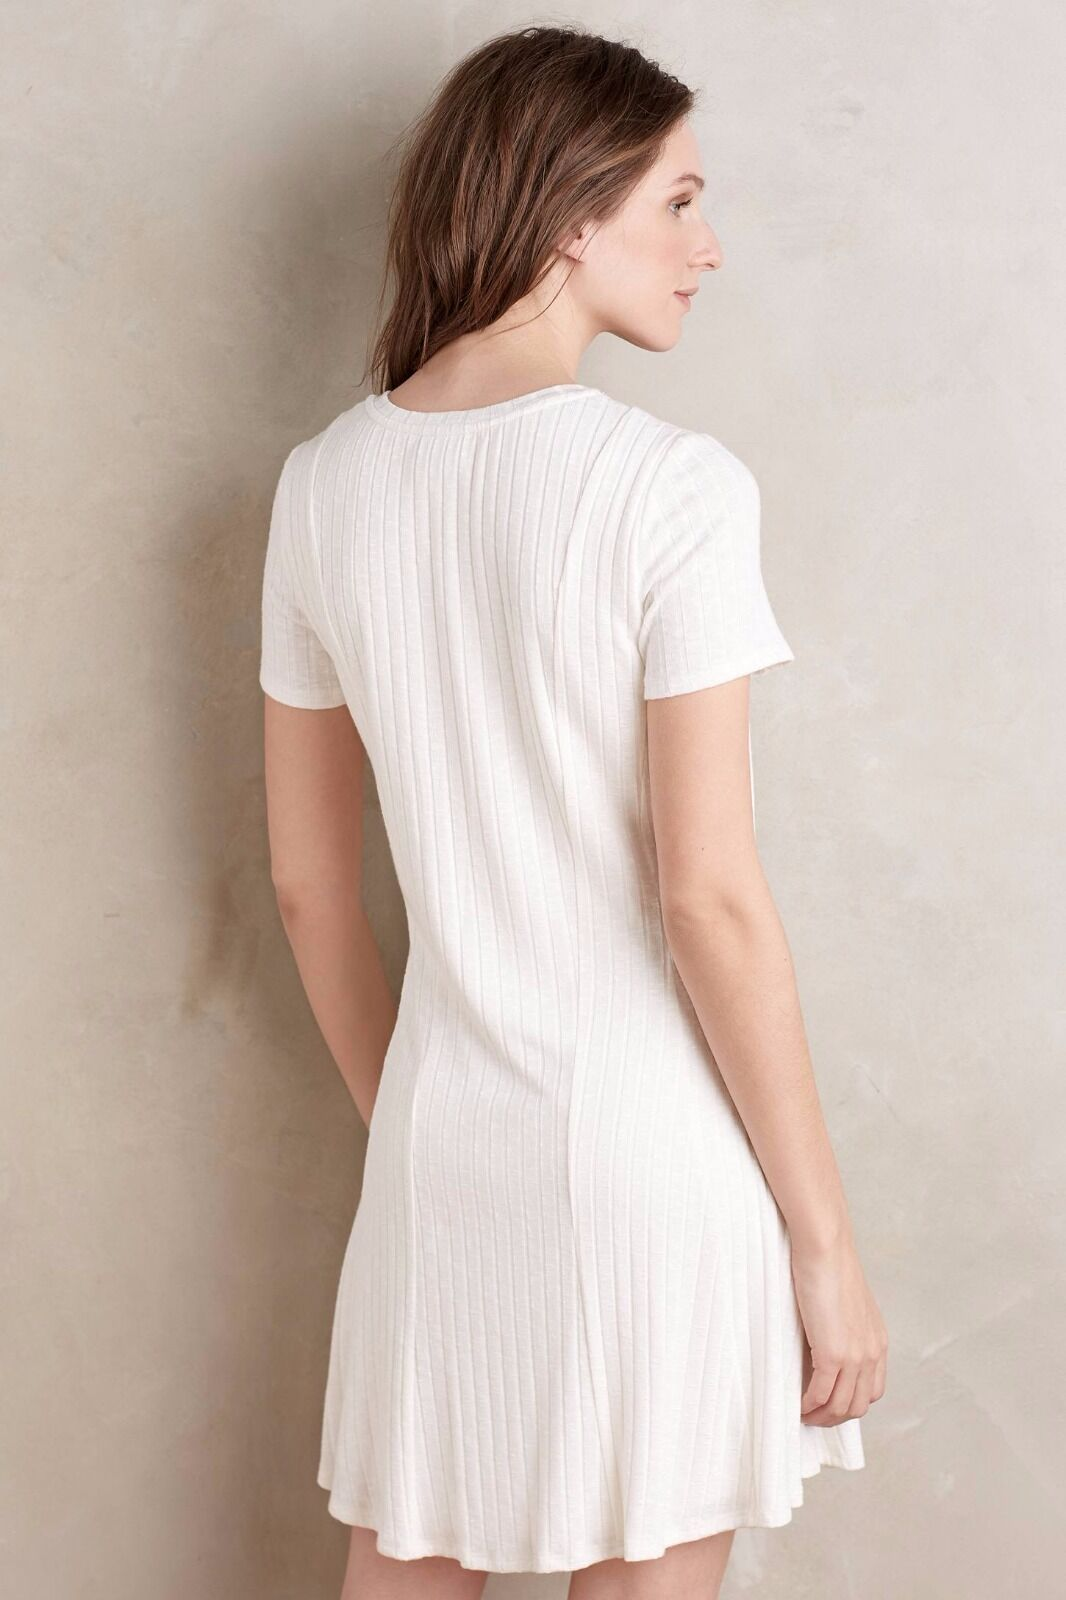 NWT SZ M RIBBED FLARE DRESS BY DOLAN DOLAN DOLAN LEFT COAST WHITE 8cfdaa